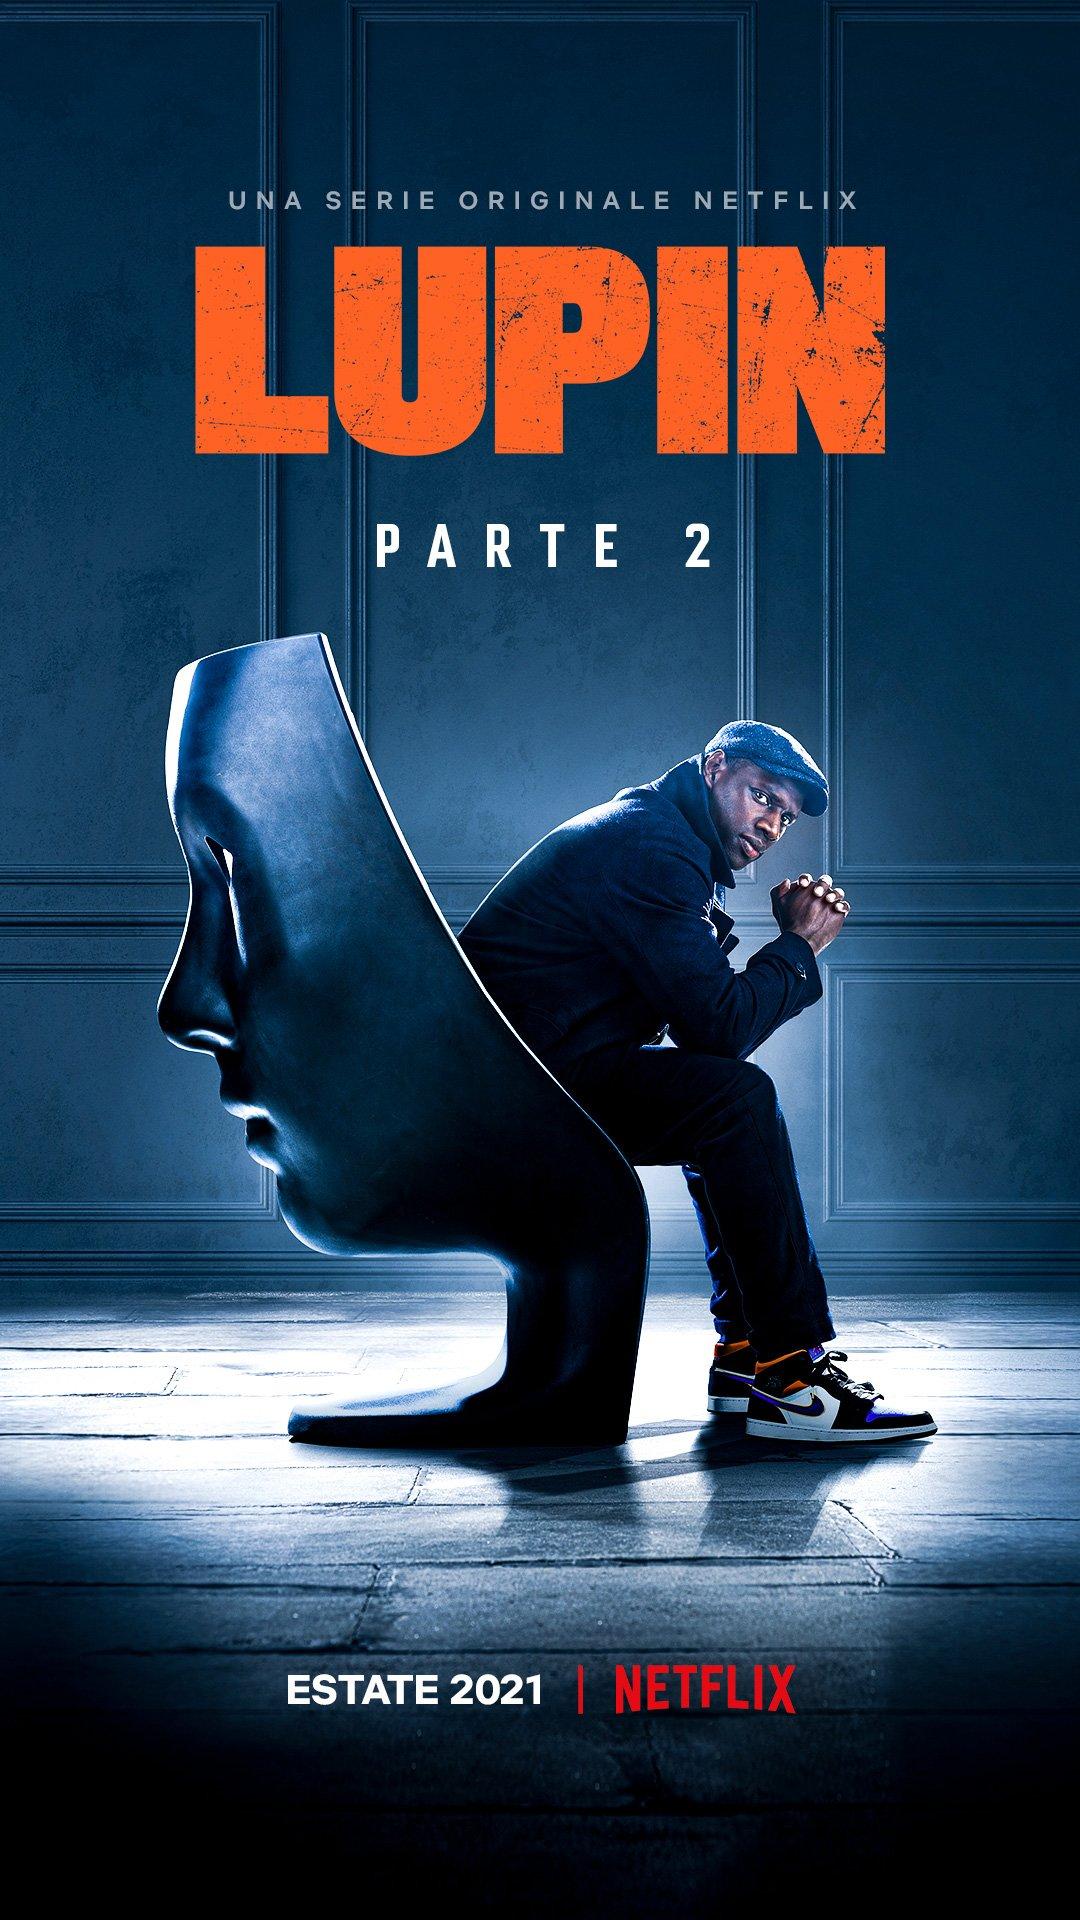 Lupin Netflix Parte 2